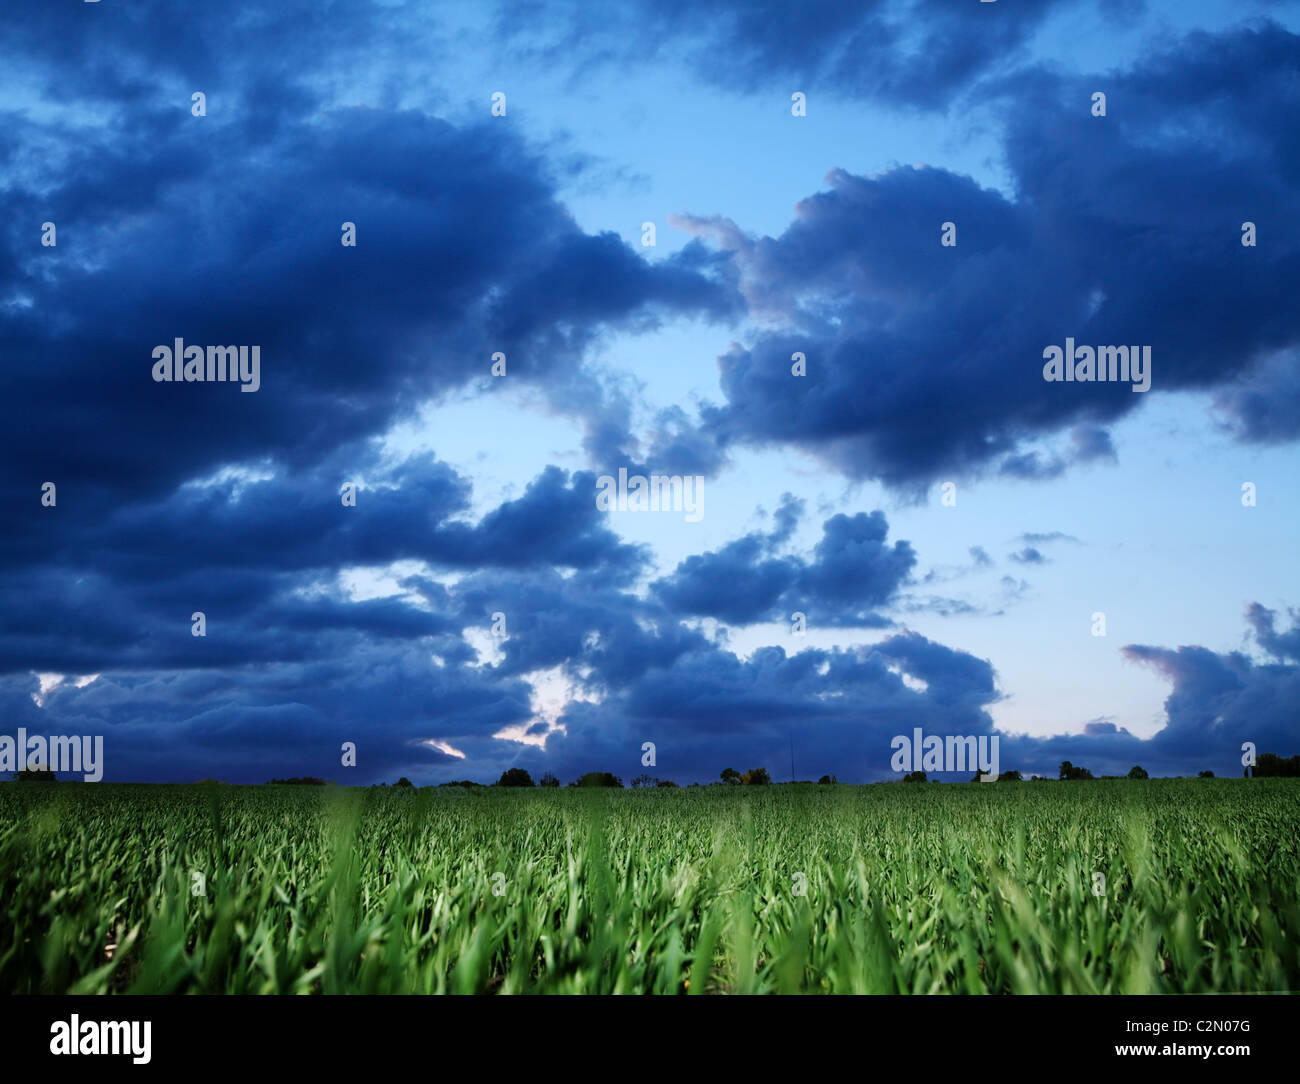 Wheat field and dark blue stormy sky. - Stock Image